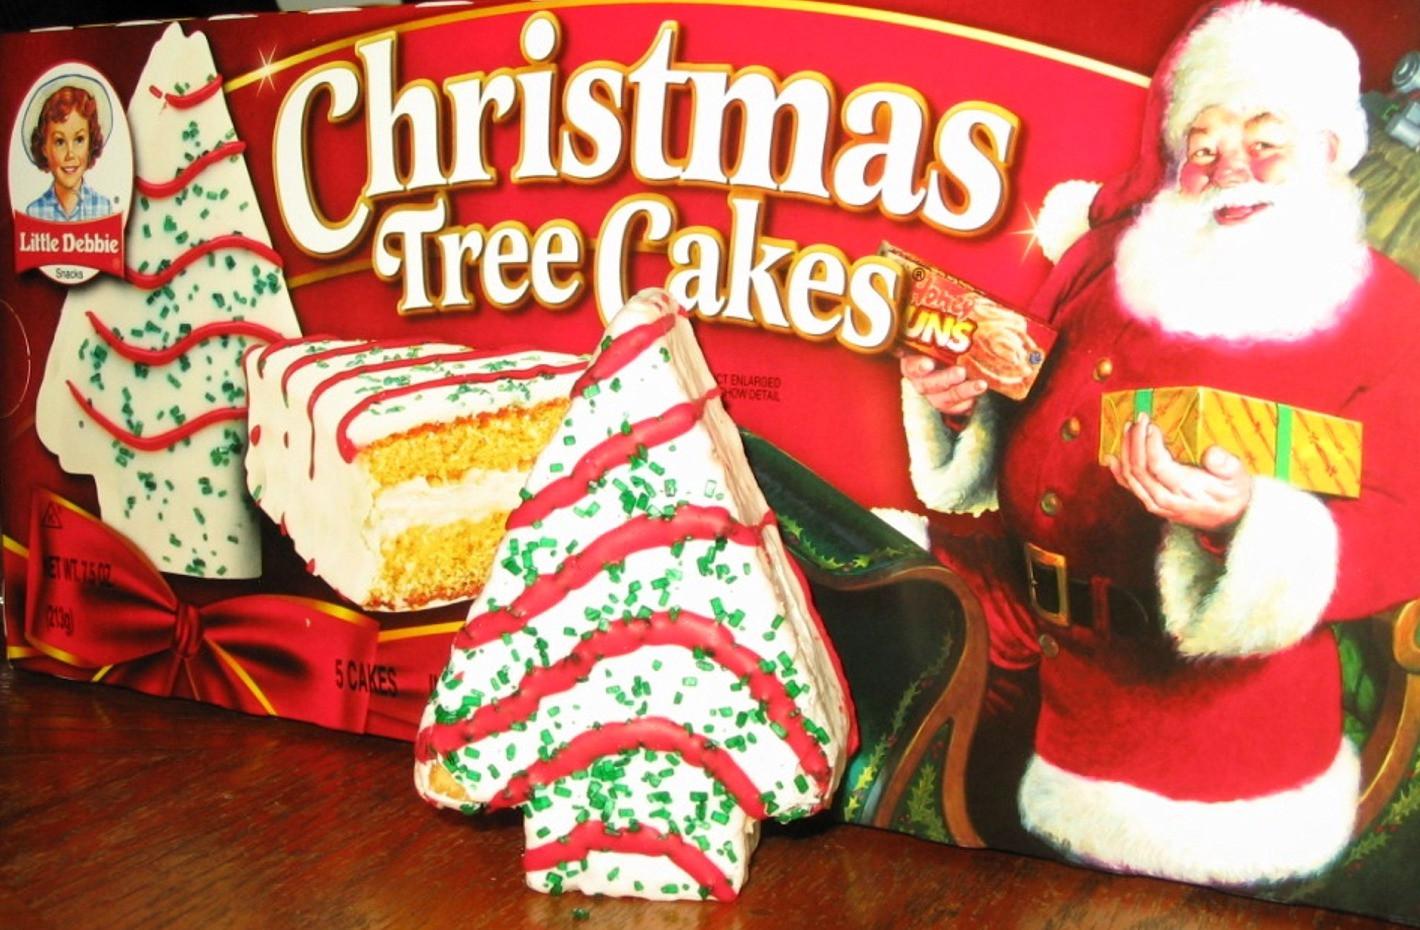 Christmas Tree Snack Cakes  The Holidaze Little Debbie Christmas Tree Cakes